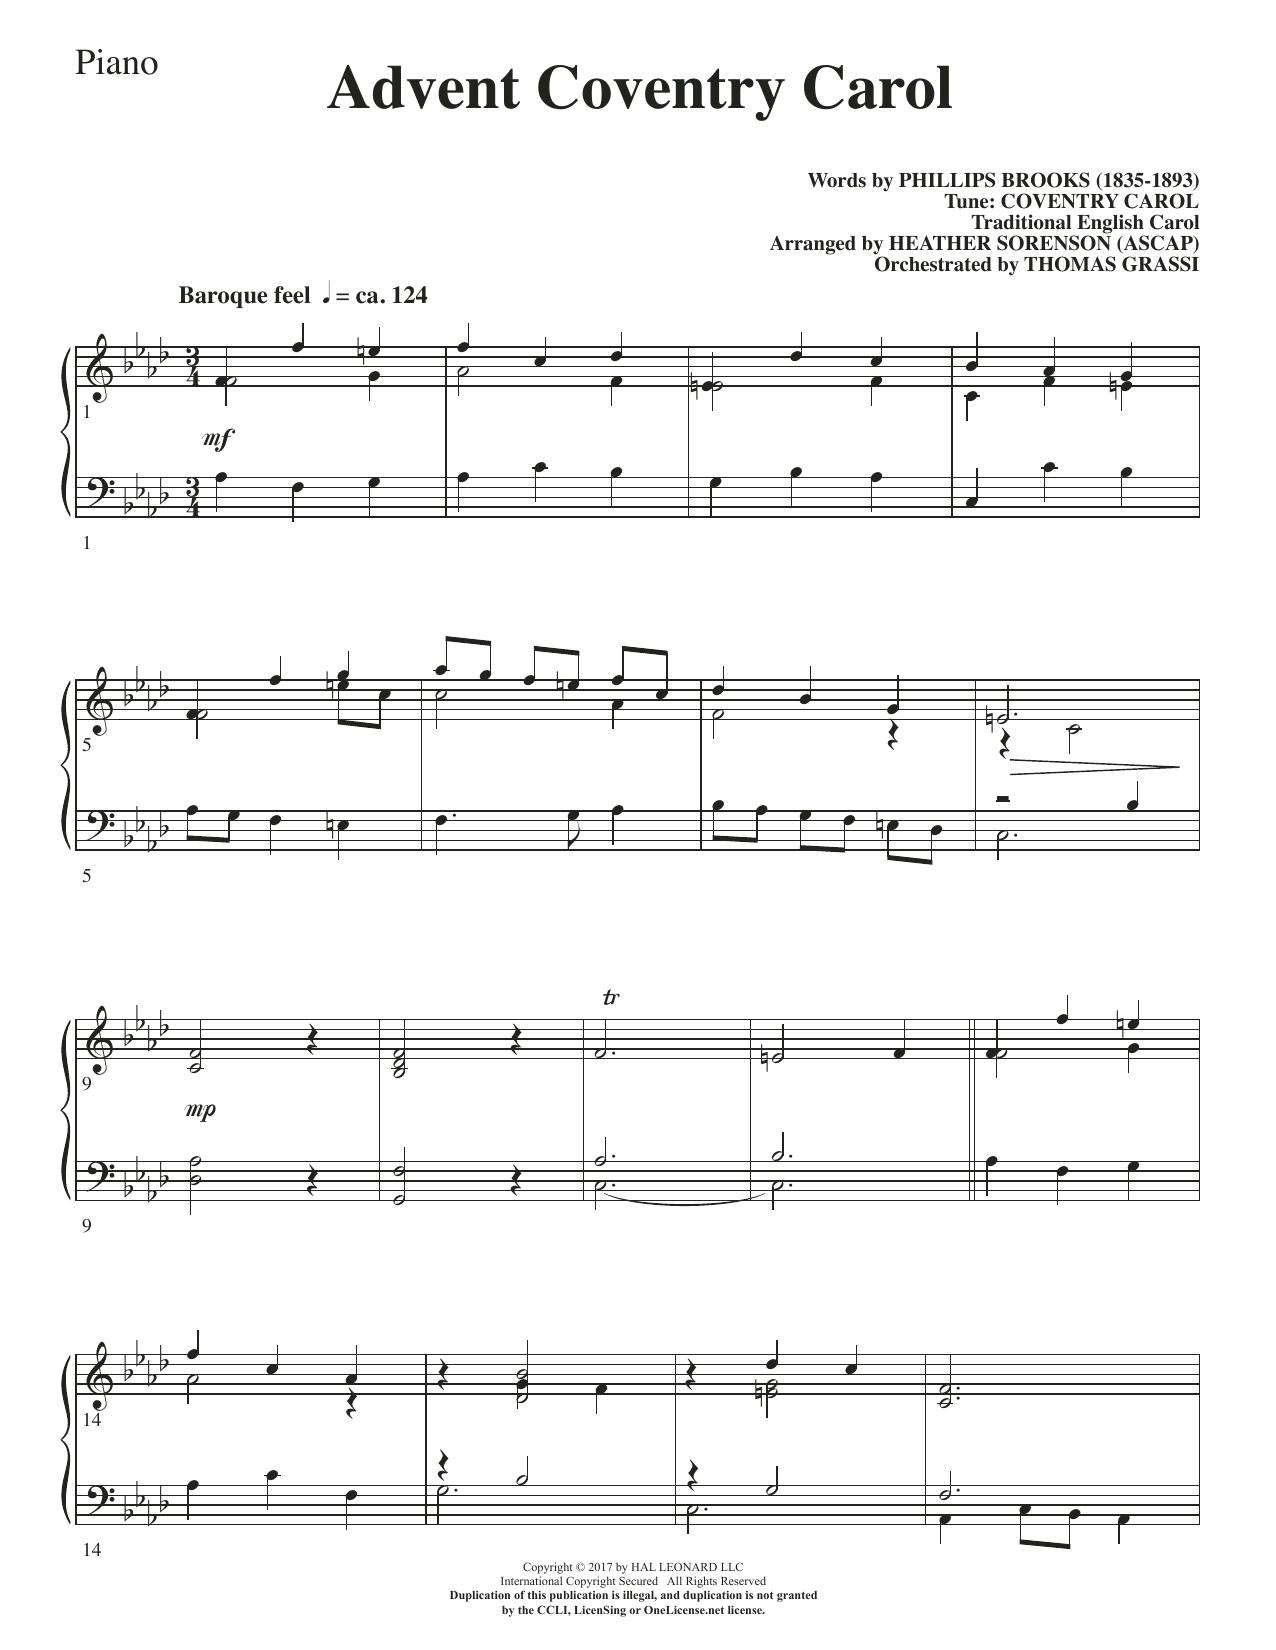 Coventry Carol - Advent Coventry Carol - Piano